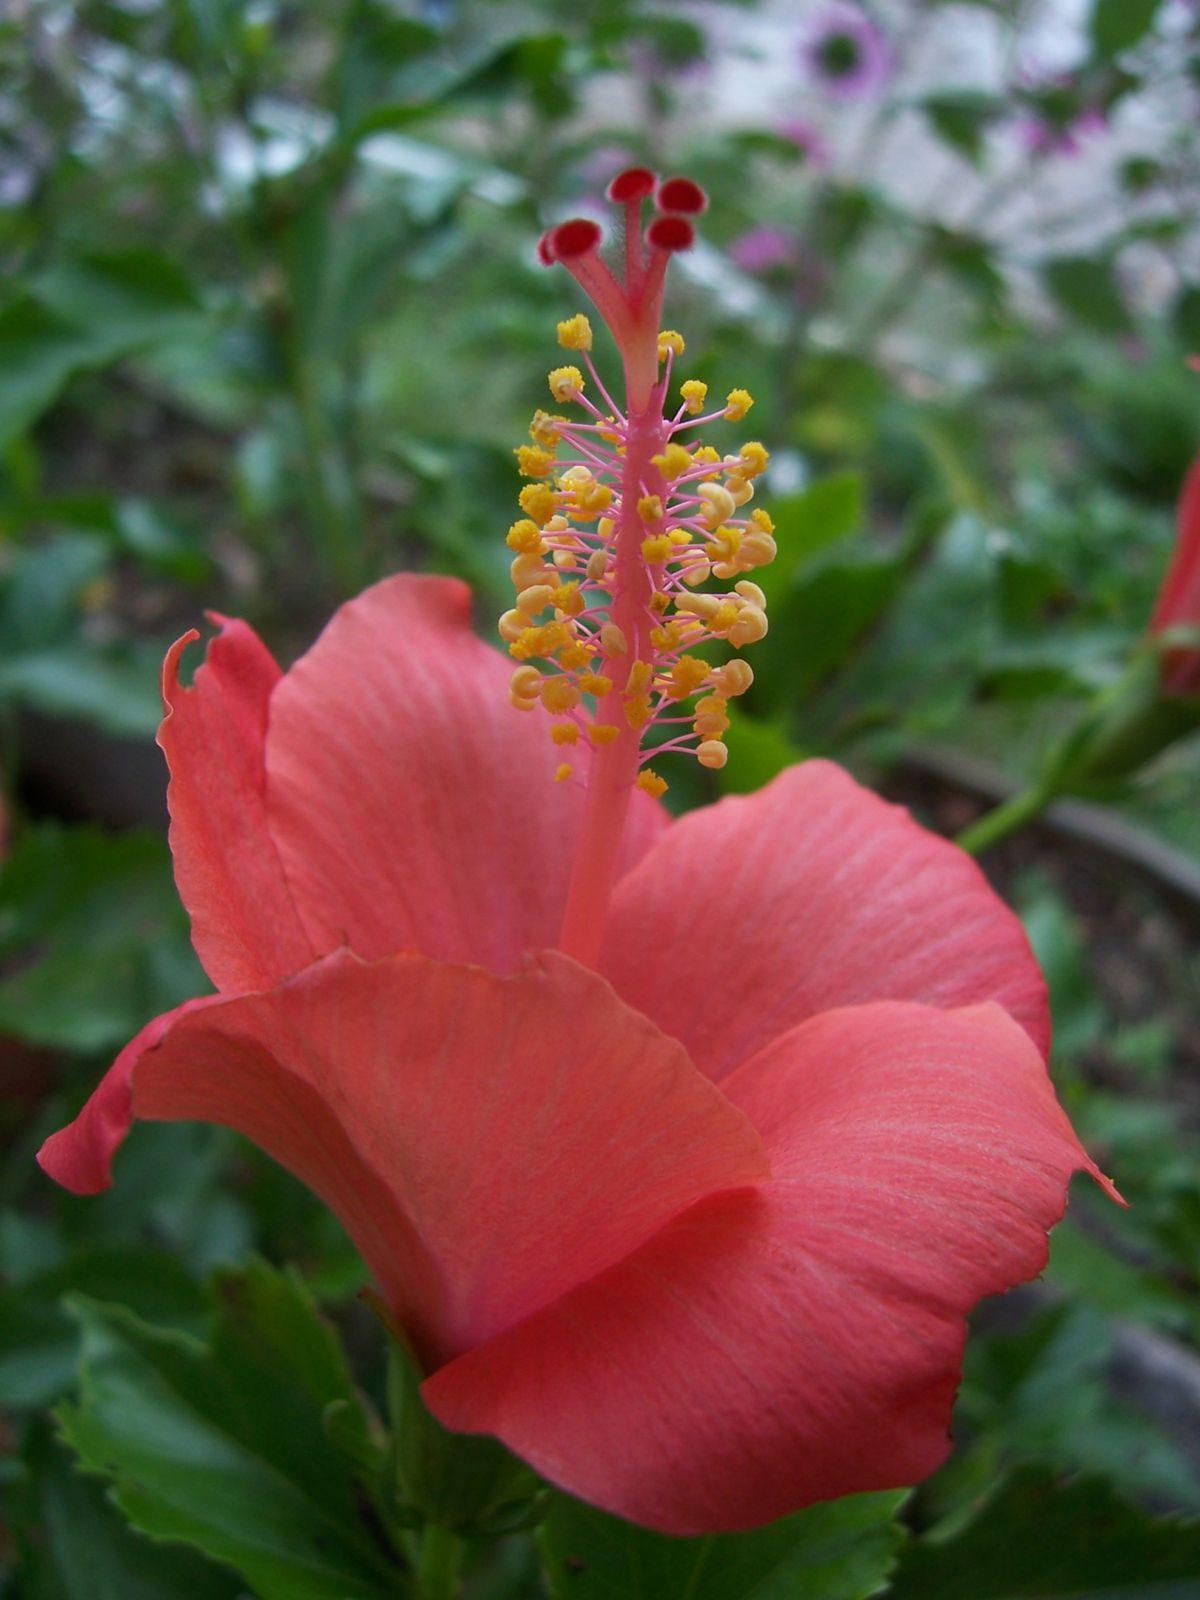 Image-photo : fleur d hibiscus